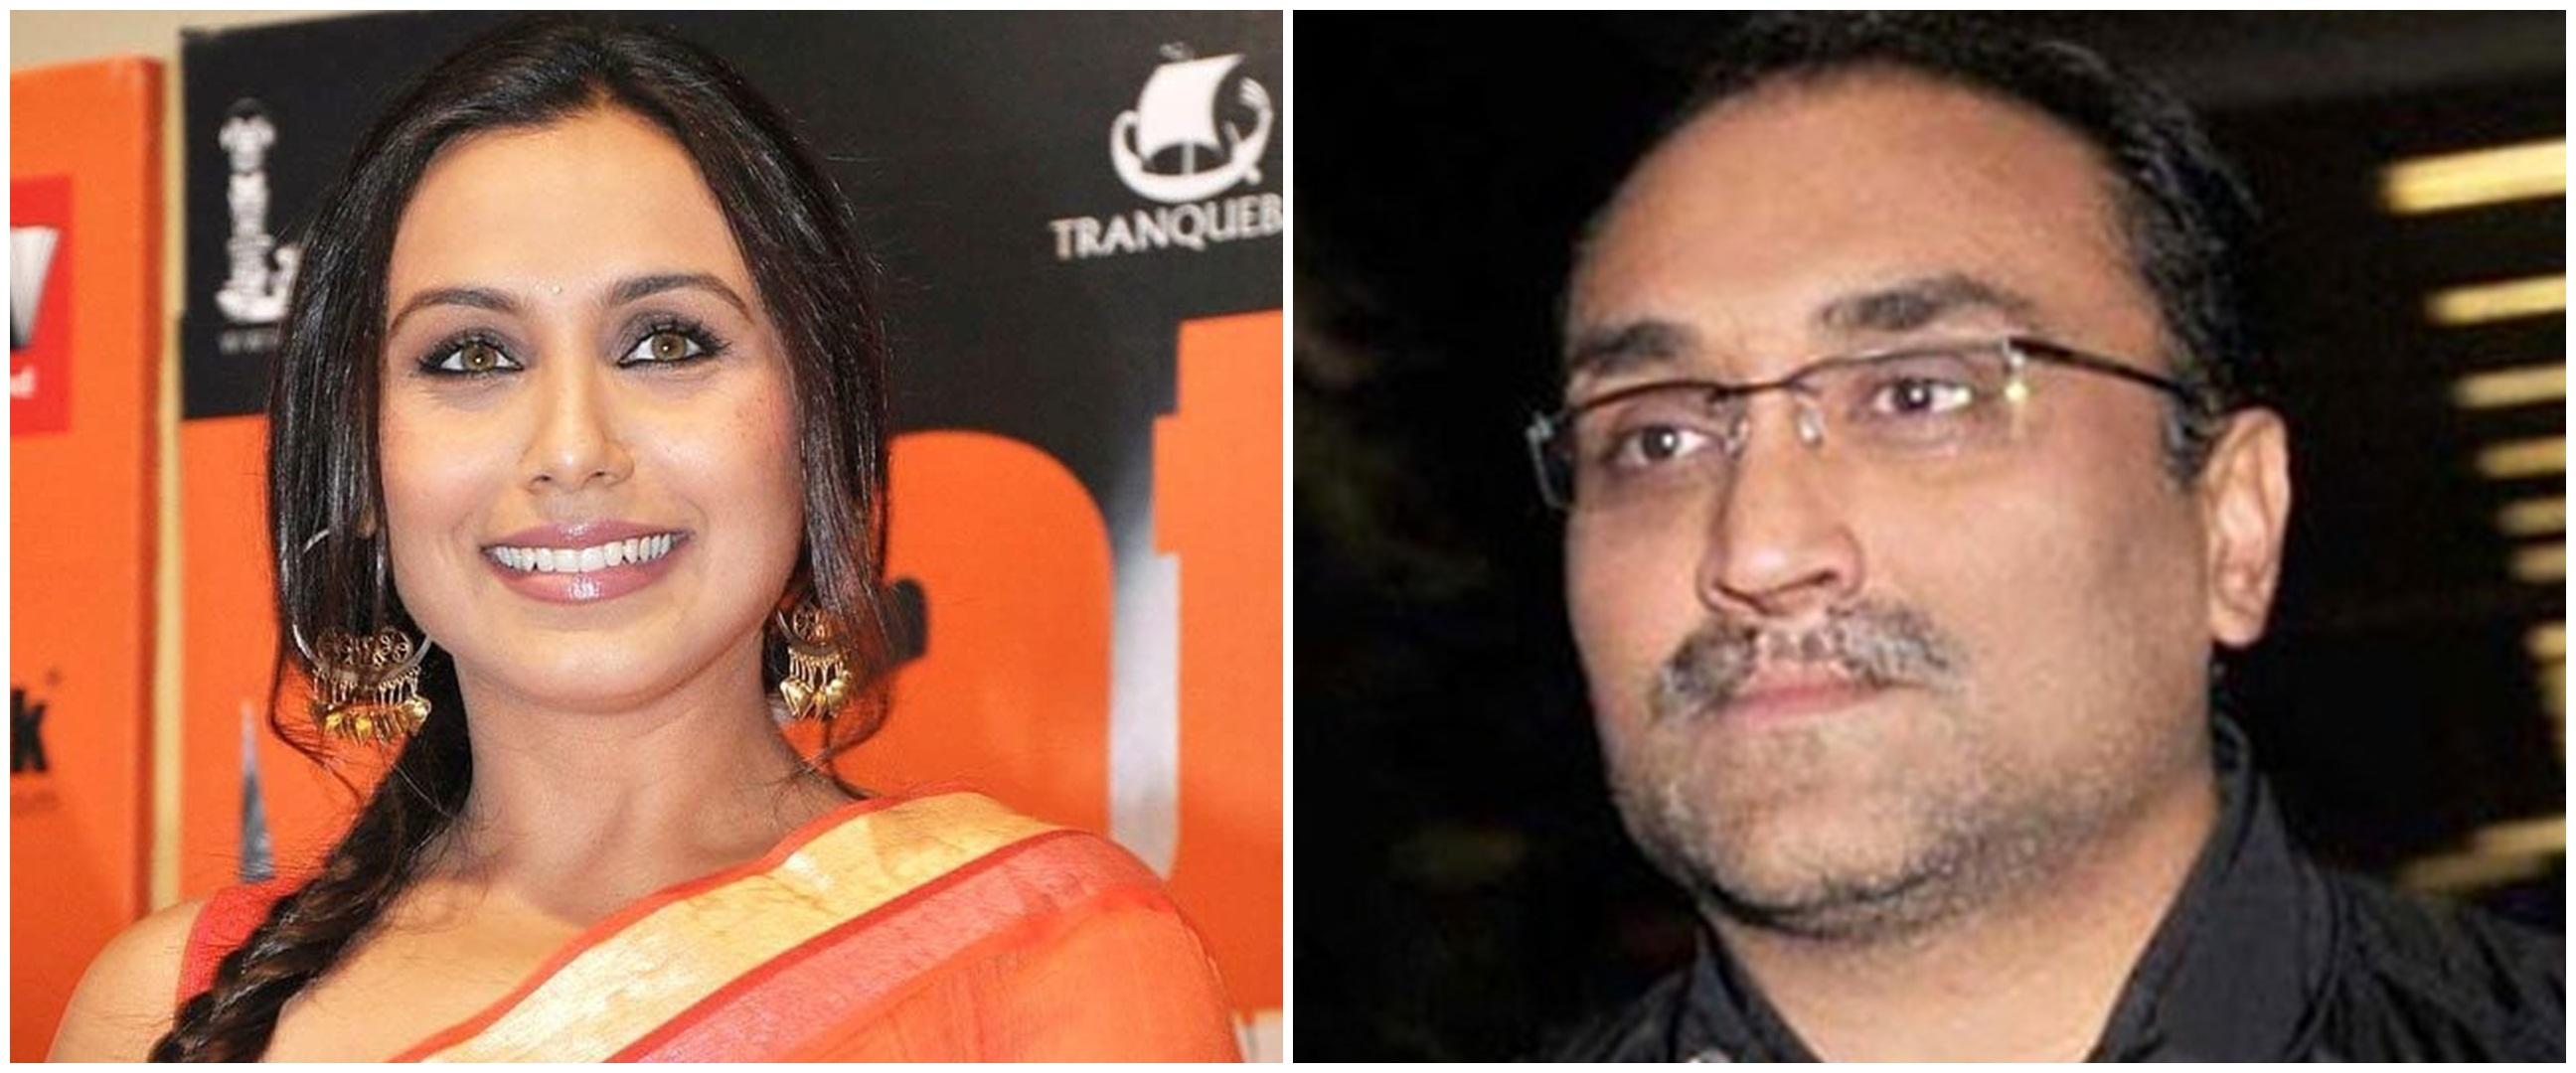 Alasan Rani Mukerji jatuh cinta pada Aditya Chopra ini tak terduga